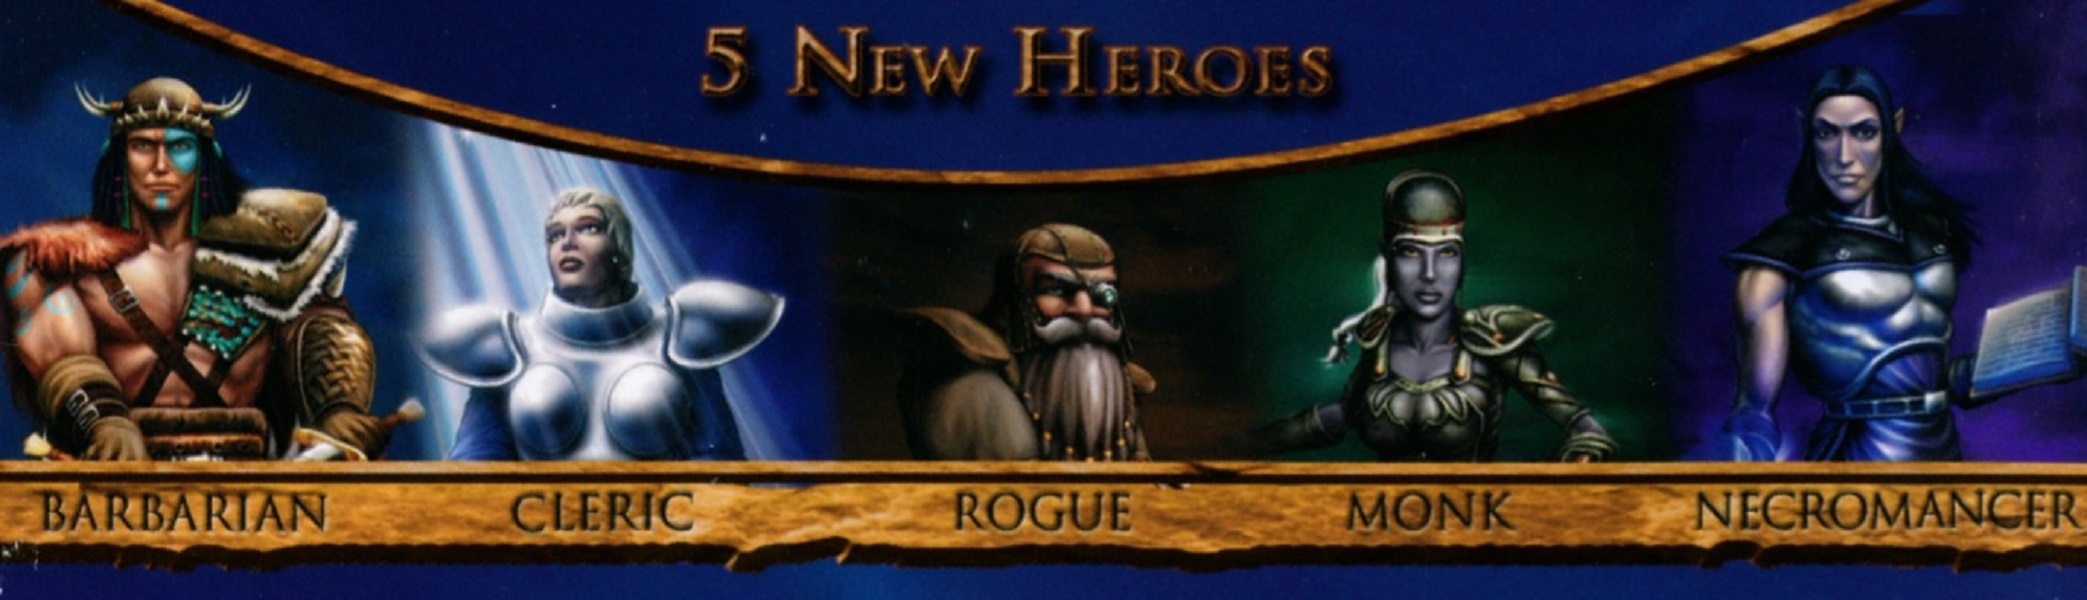 The elusive Baldur's Gate: Dark Alliance II could get a re-release too, according to the original studio screenshot